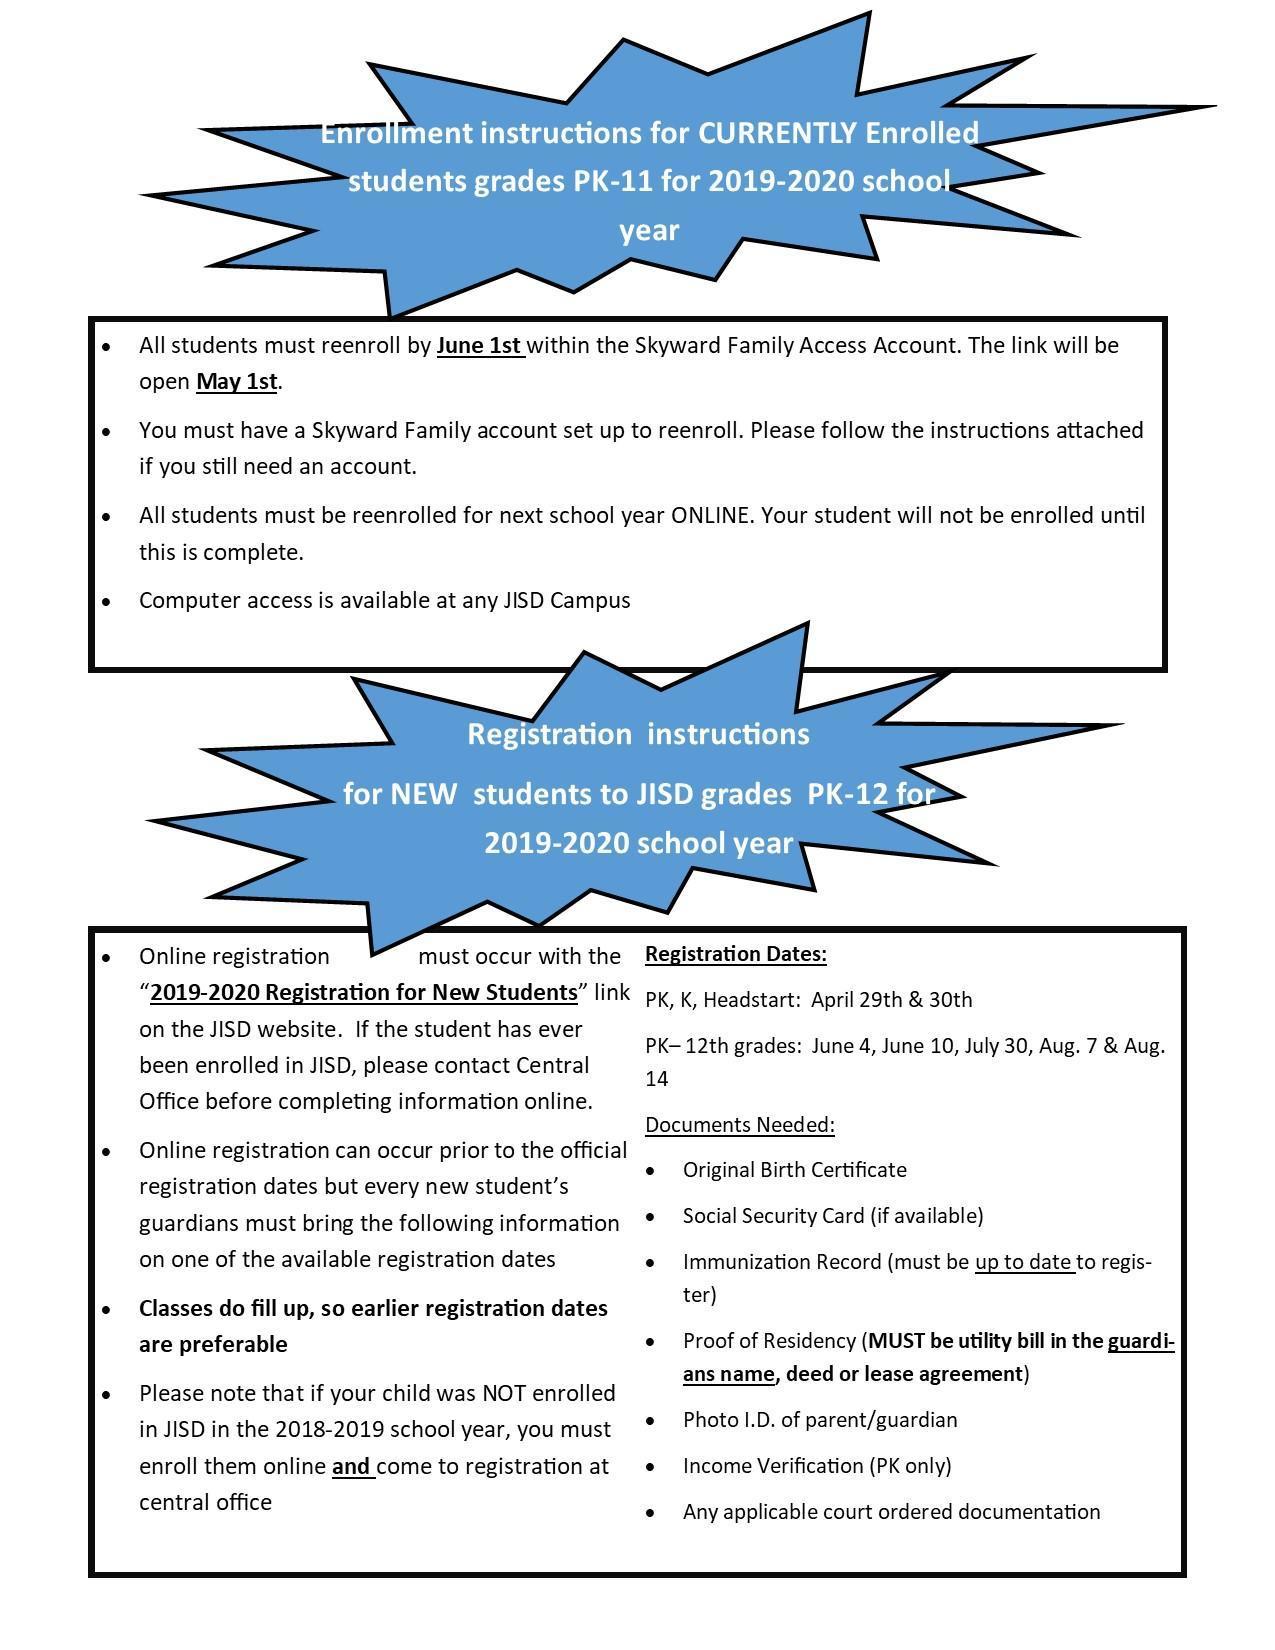 Instructions for enrollment dates